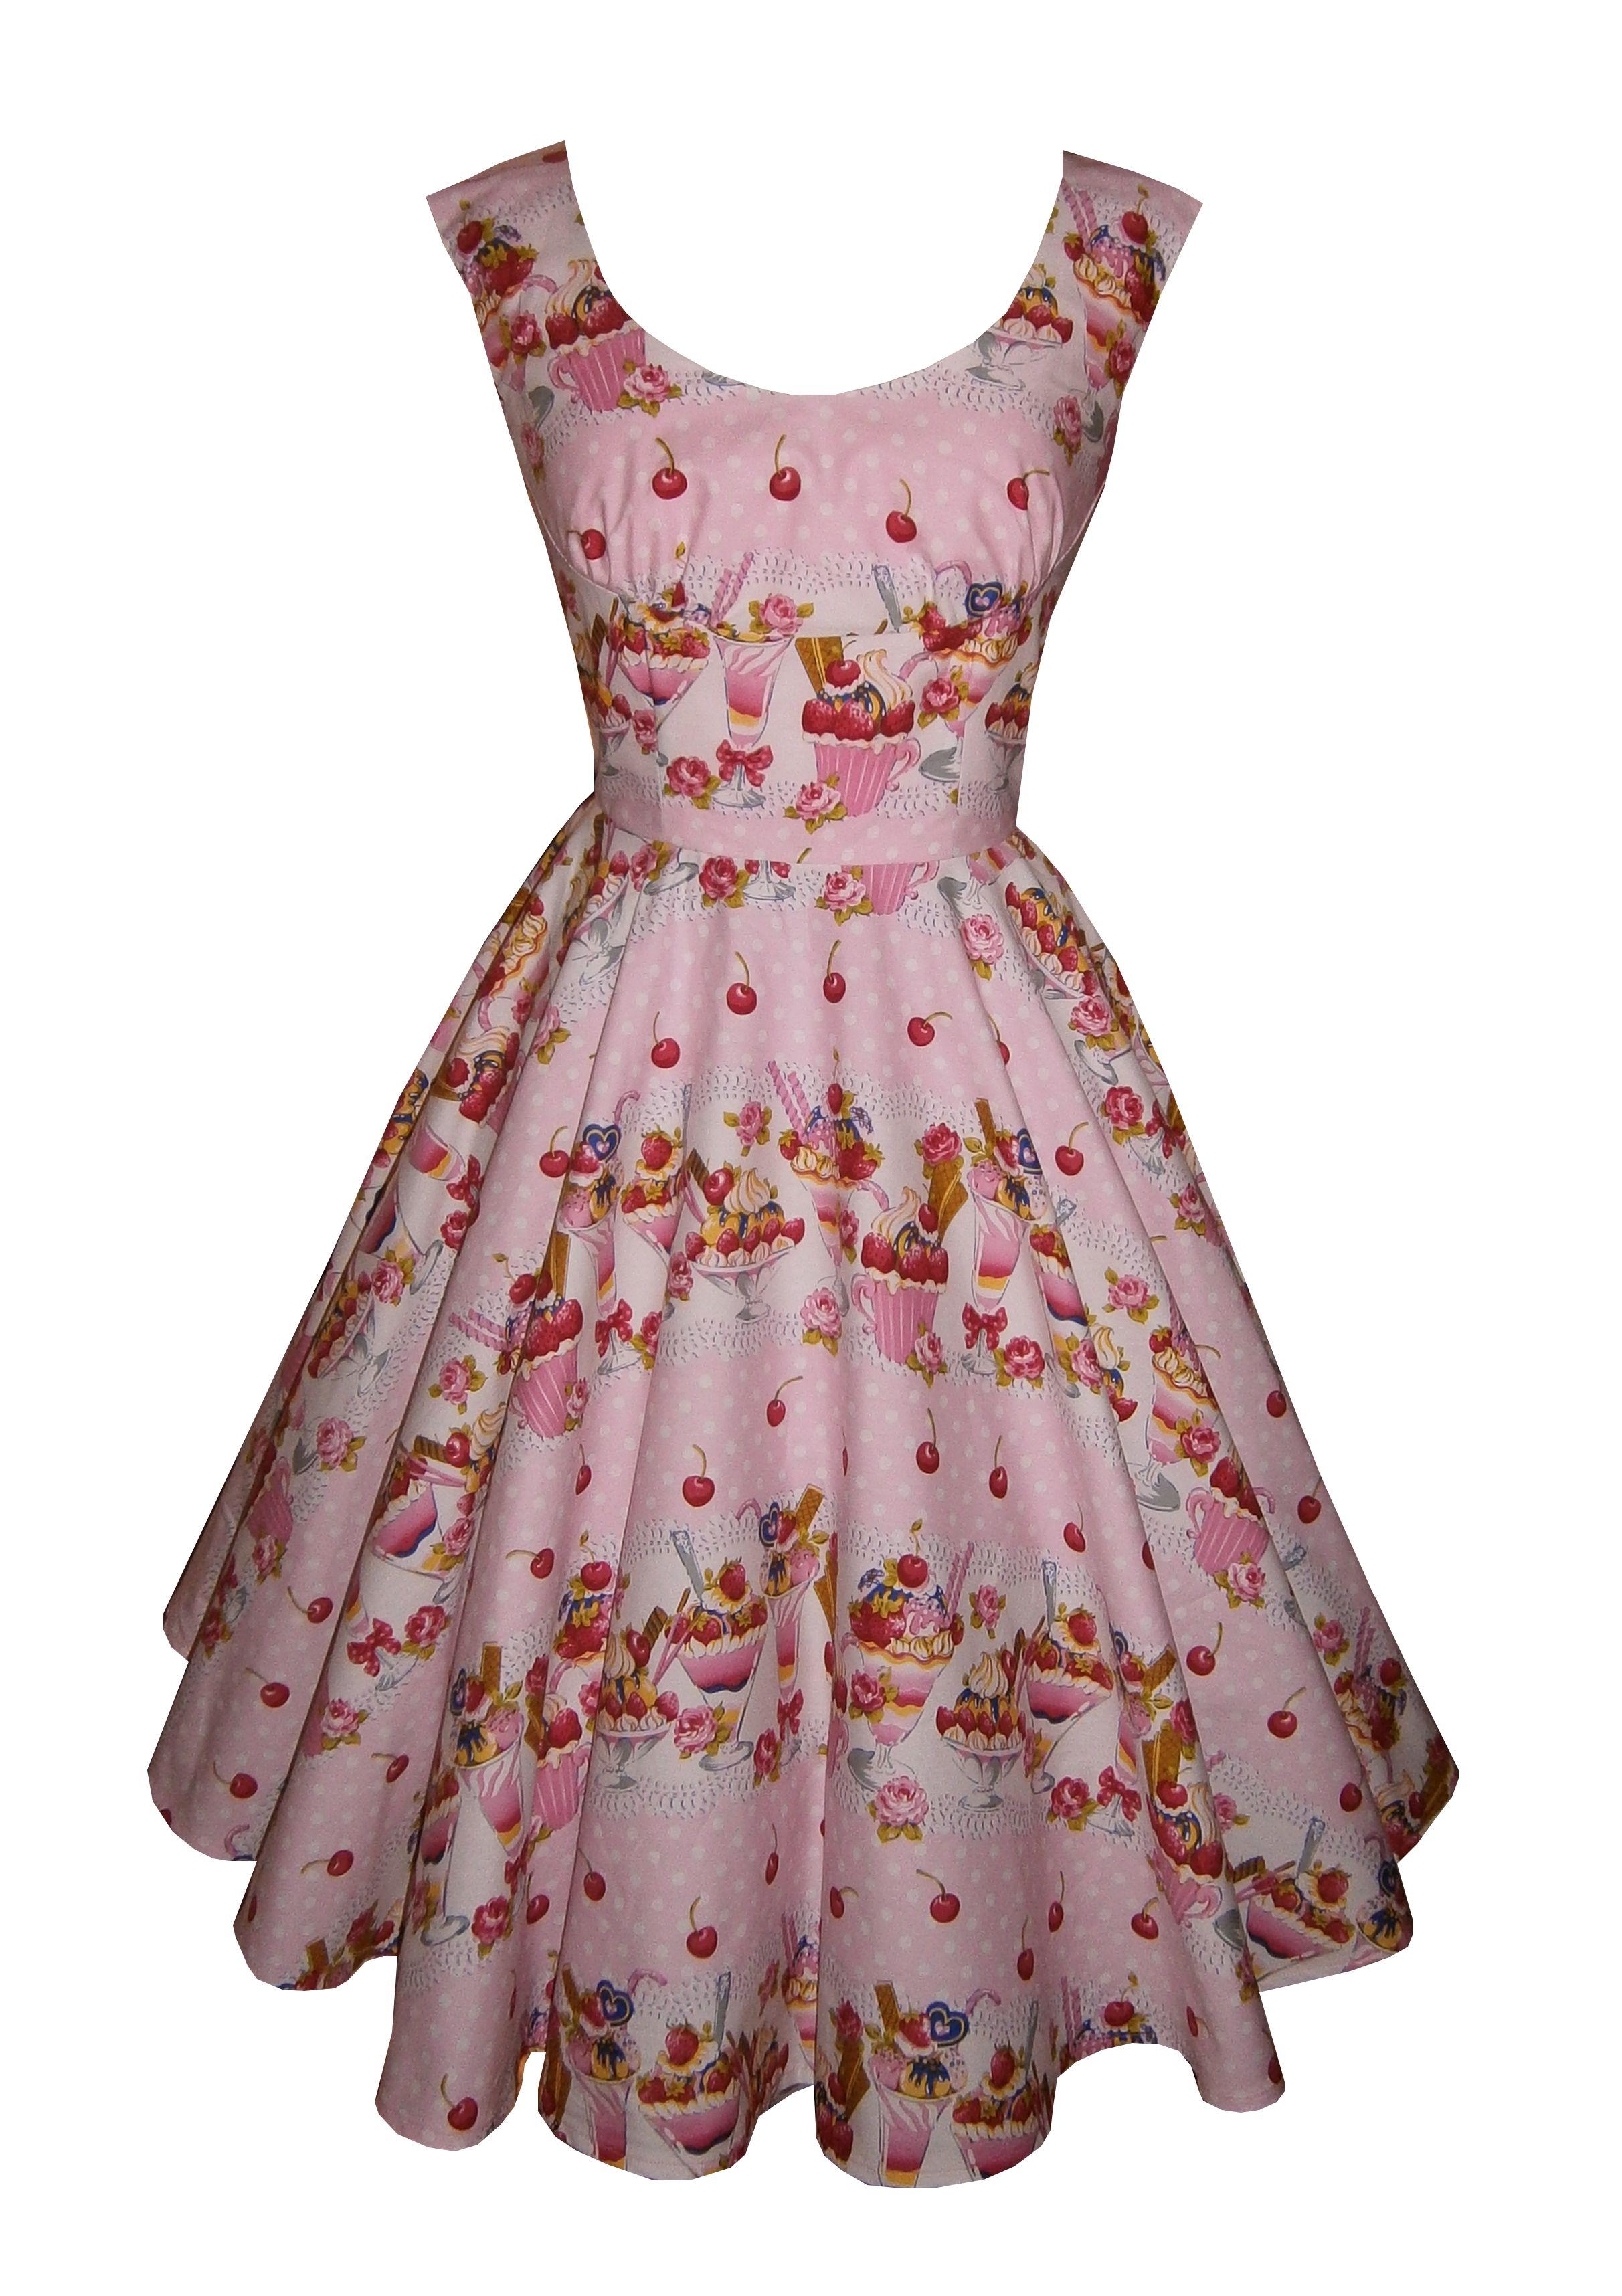 'Sweet Sundae' - Full circle 'Cecelia' in pink sundae cotton. 1950s vintage style dress. £50